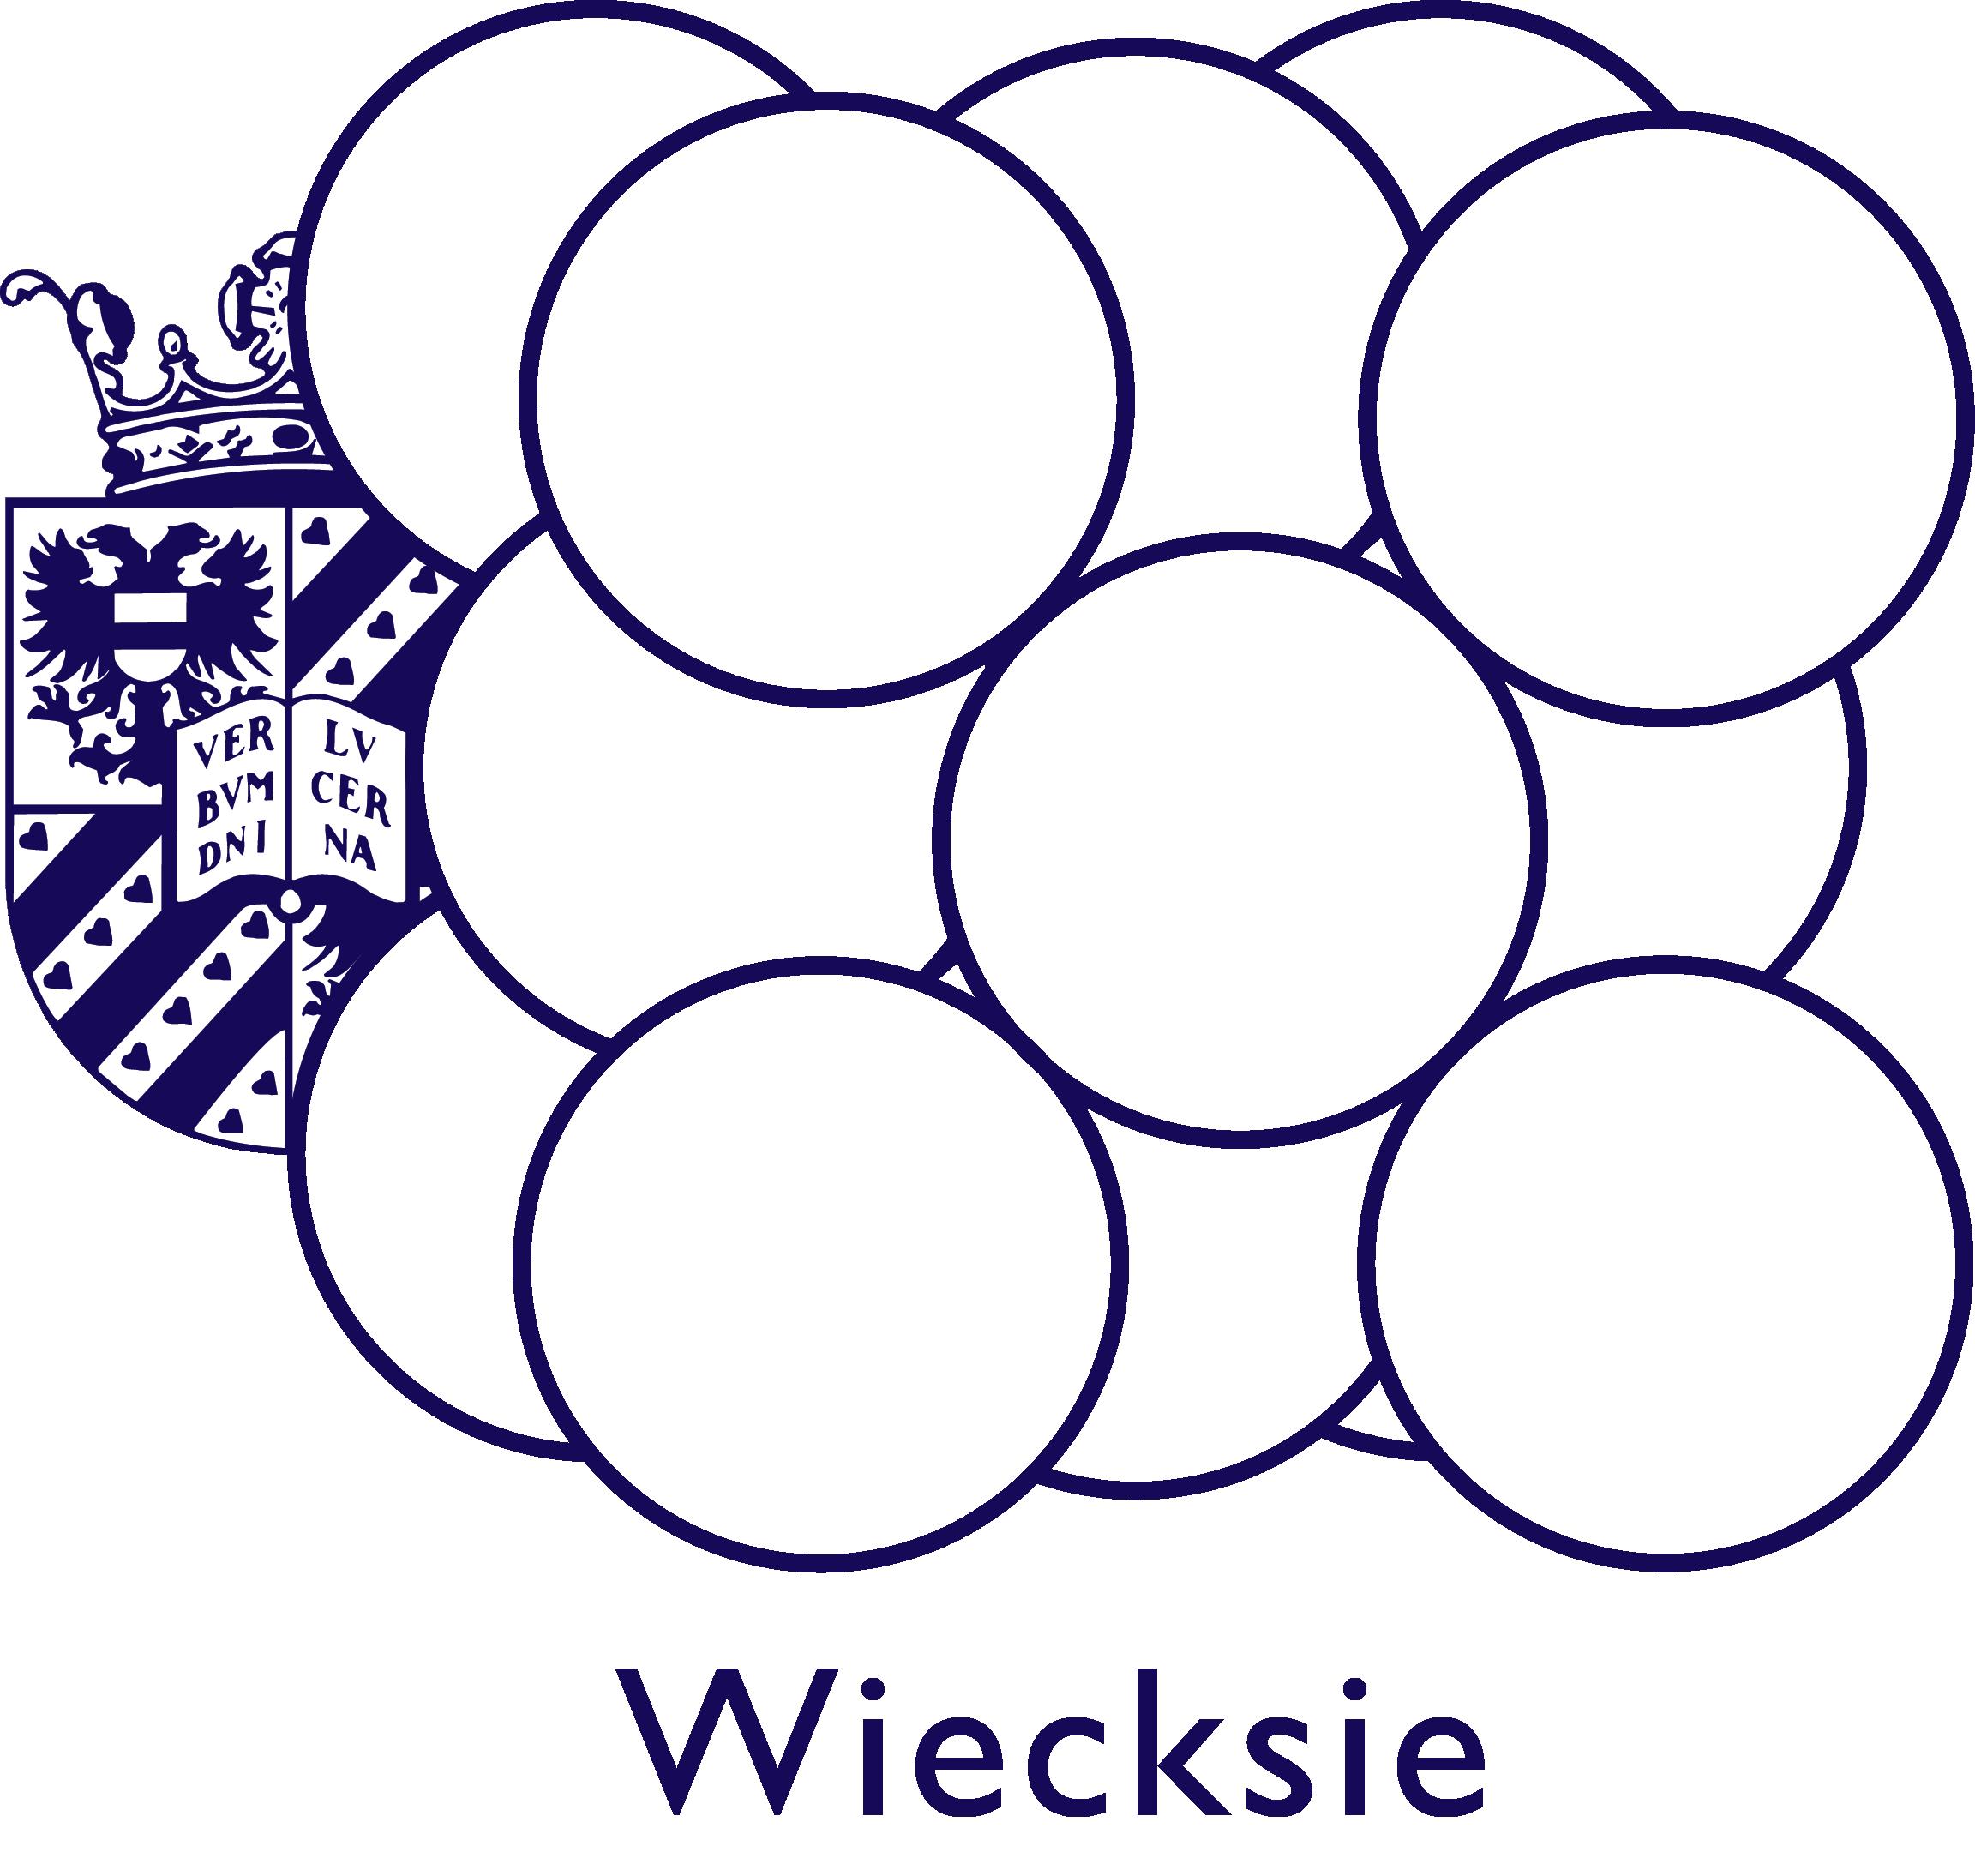 Wiecksie's logo